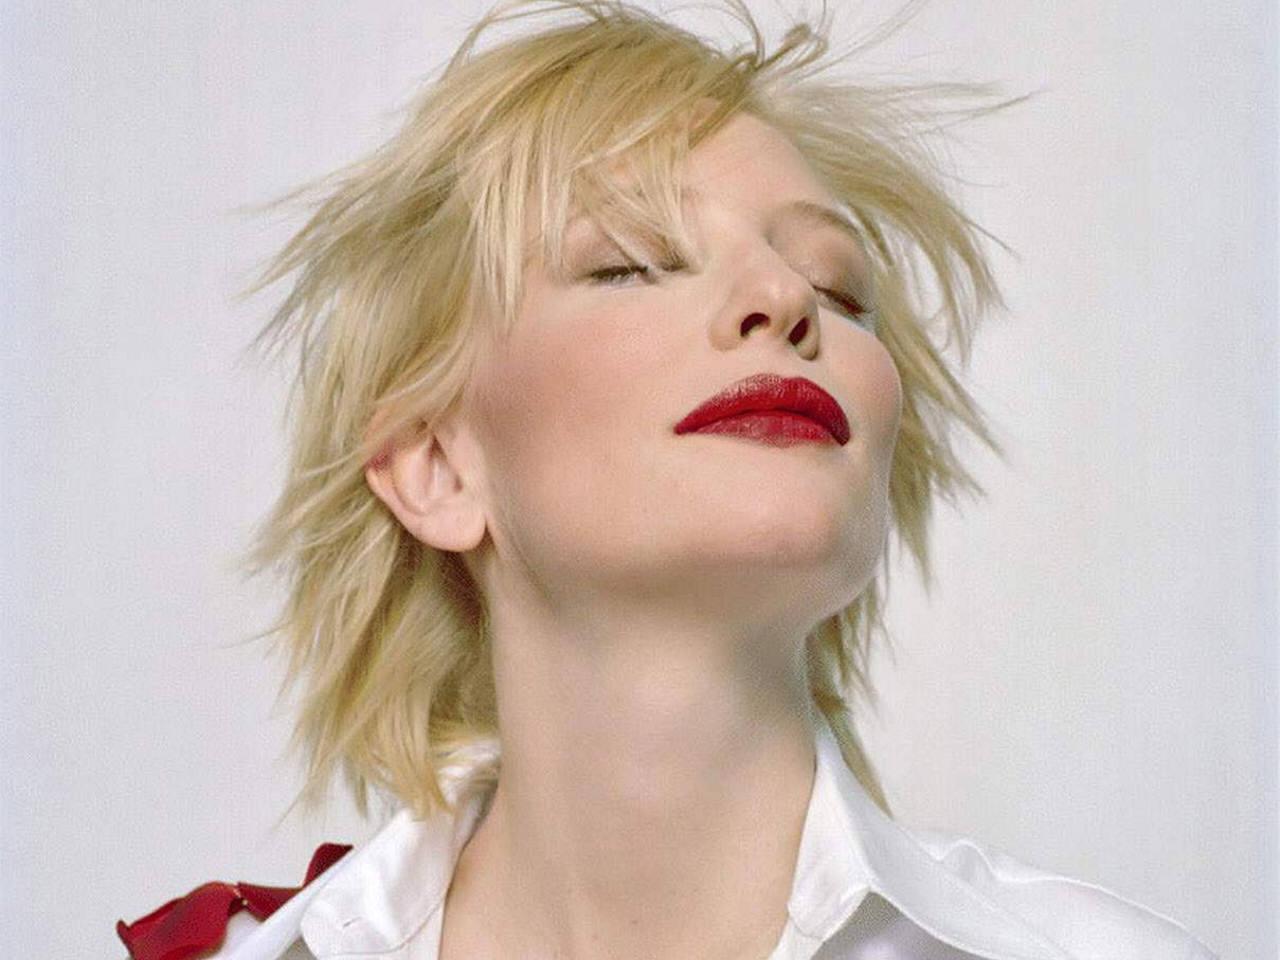 http://1.bp.blogspot.com/_Si7zjQmZnm4/SpC0EV45WDI/AAAAAAAAEs8/ZolIZjvSwVk/s1600/Fullwalls.blogspot.com_Cate_Blanchett%2822%29.jpg